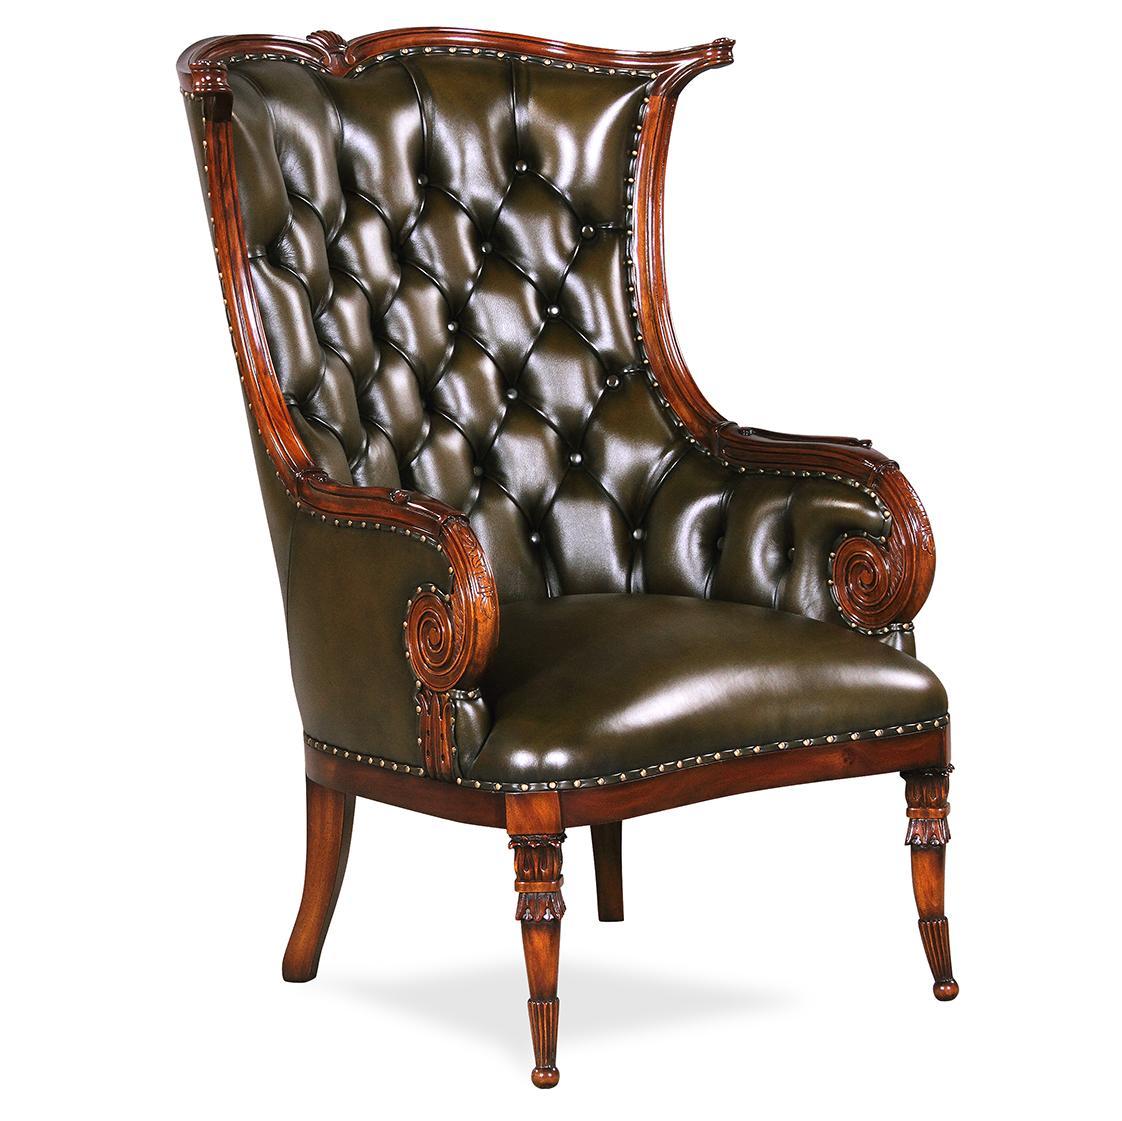 Edler Sessel aus braunem Leder und Holz Fernsehsessel